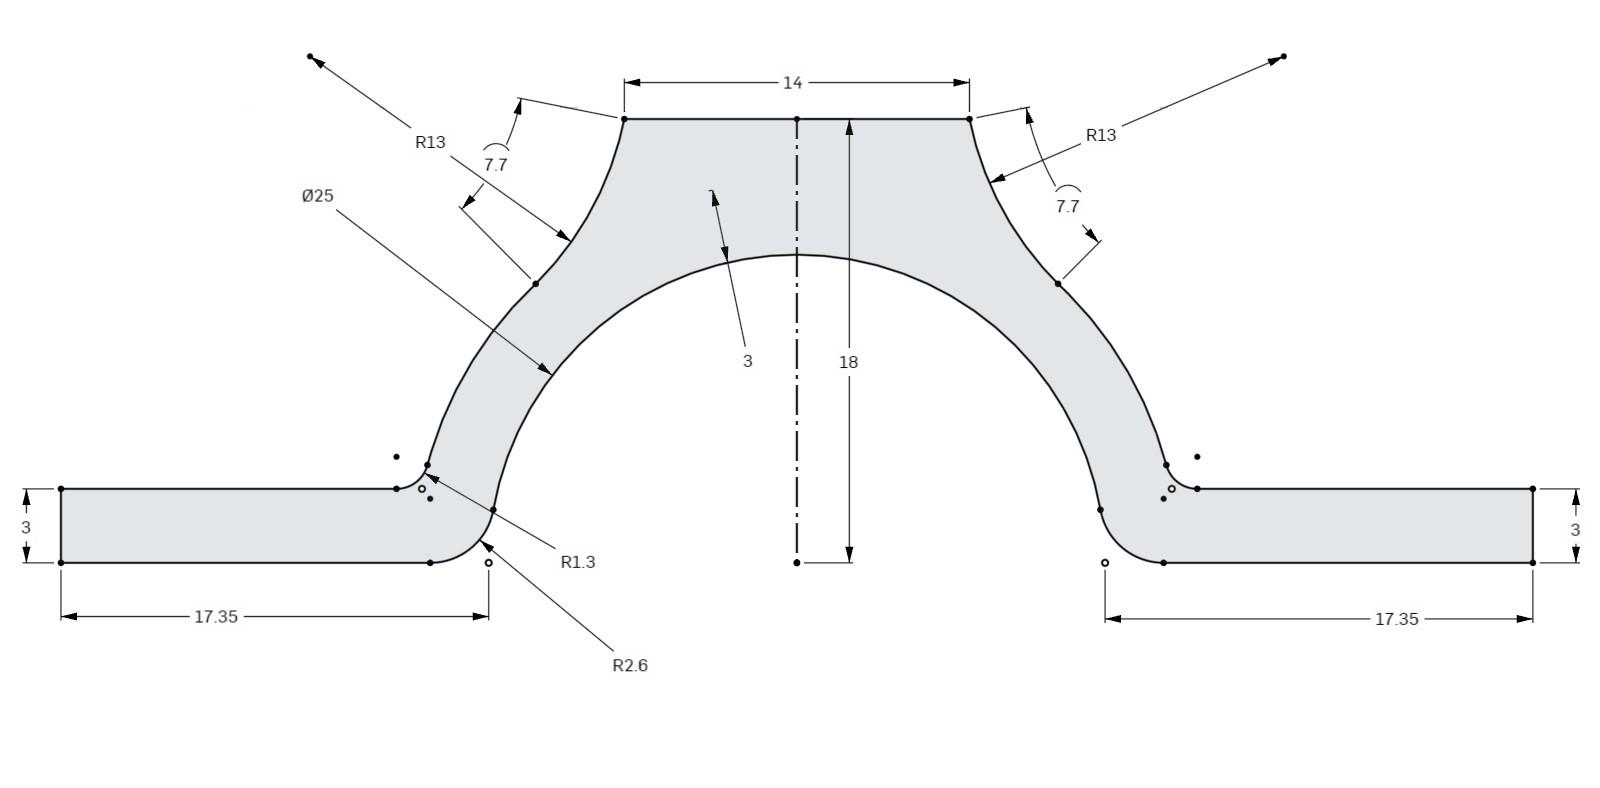 Figure 1.0